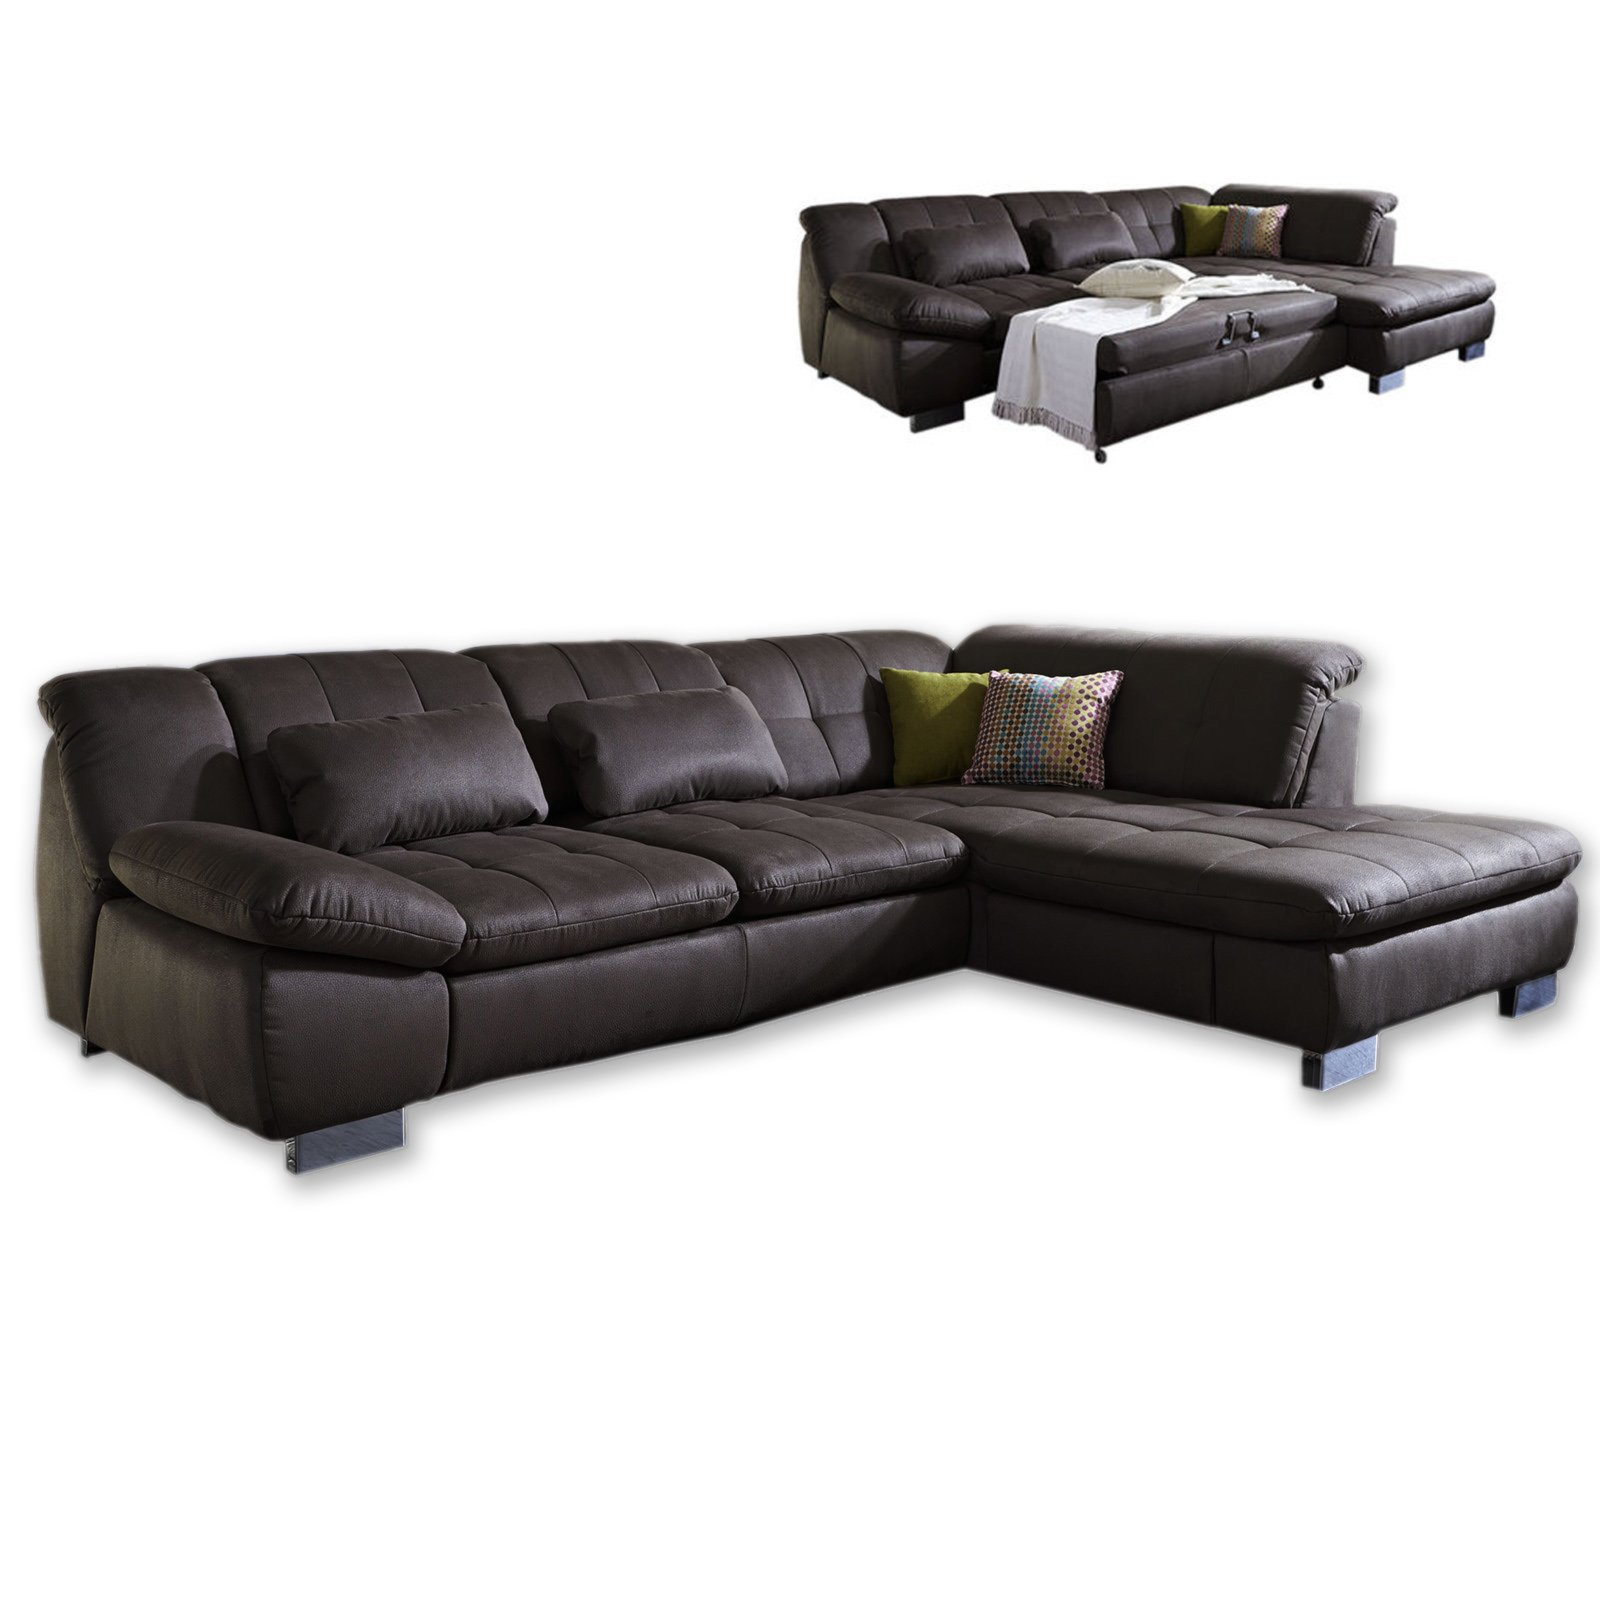 roller ecksofa mit schlaffunktion roller ecksofa mit schlaffunktion mit schlaffunktion. Black Bedroom Furniture Sets. Home Design Ideas